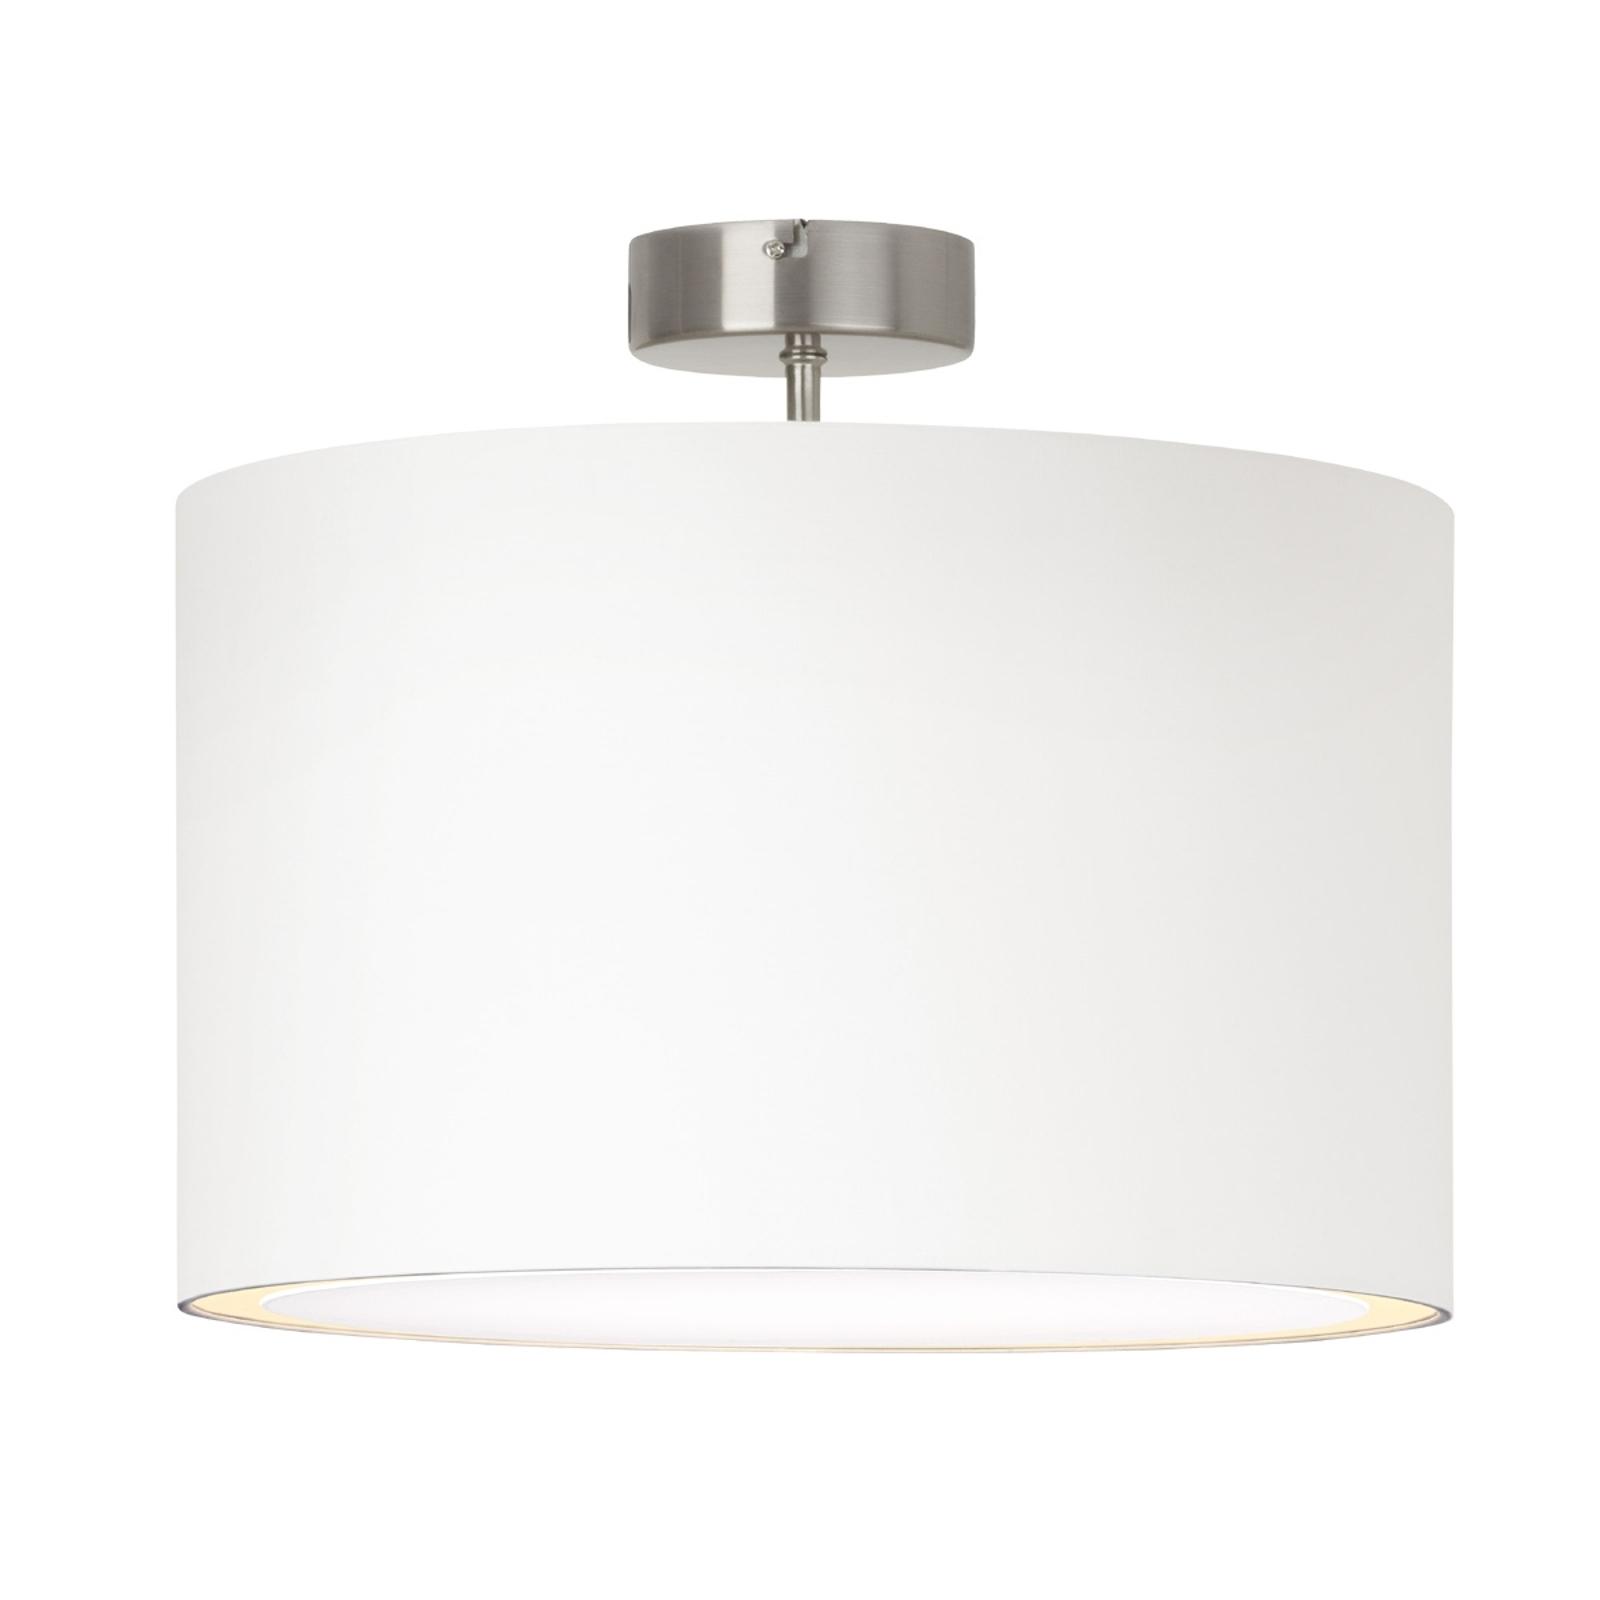 Jednoduché stropné svietidlo Clarie_1508796_1